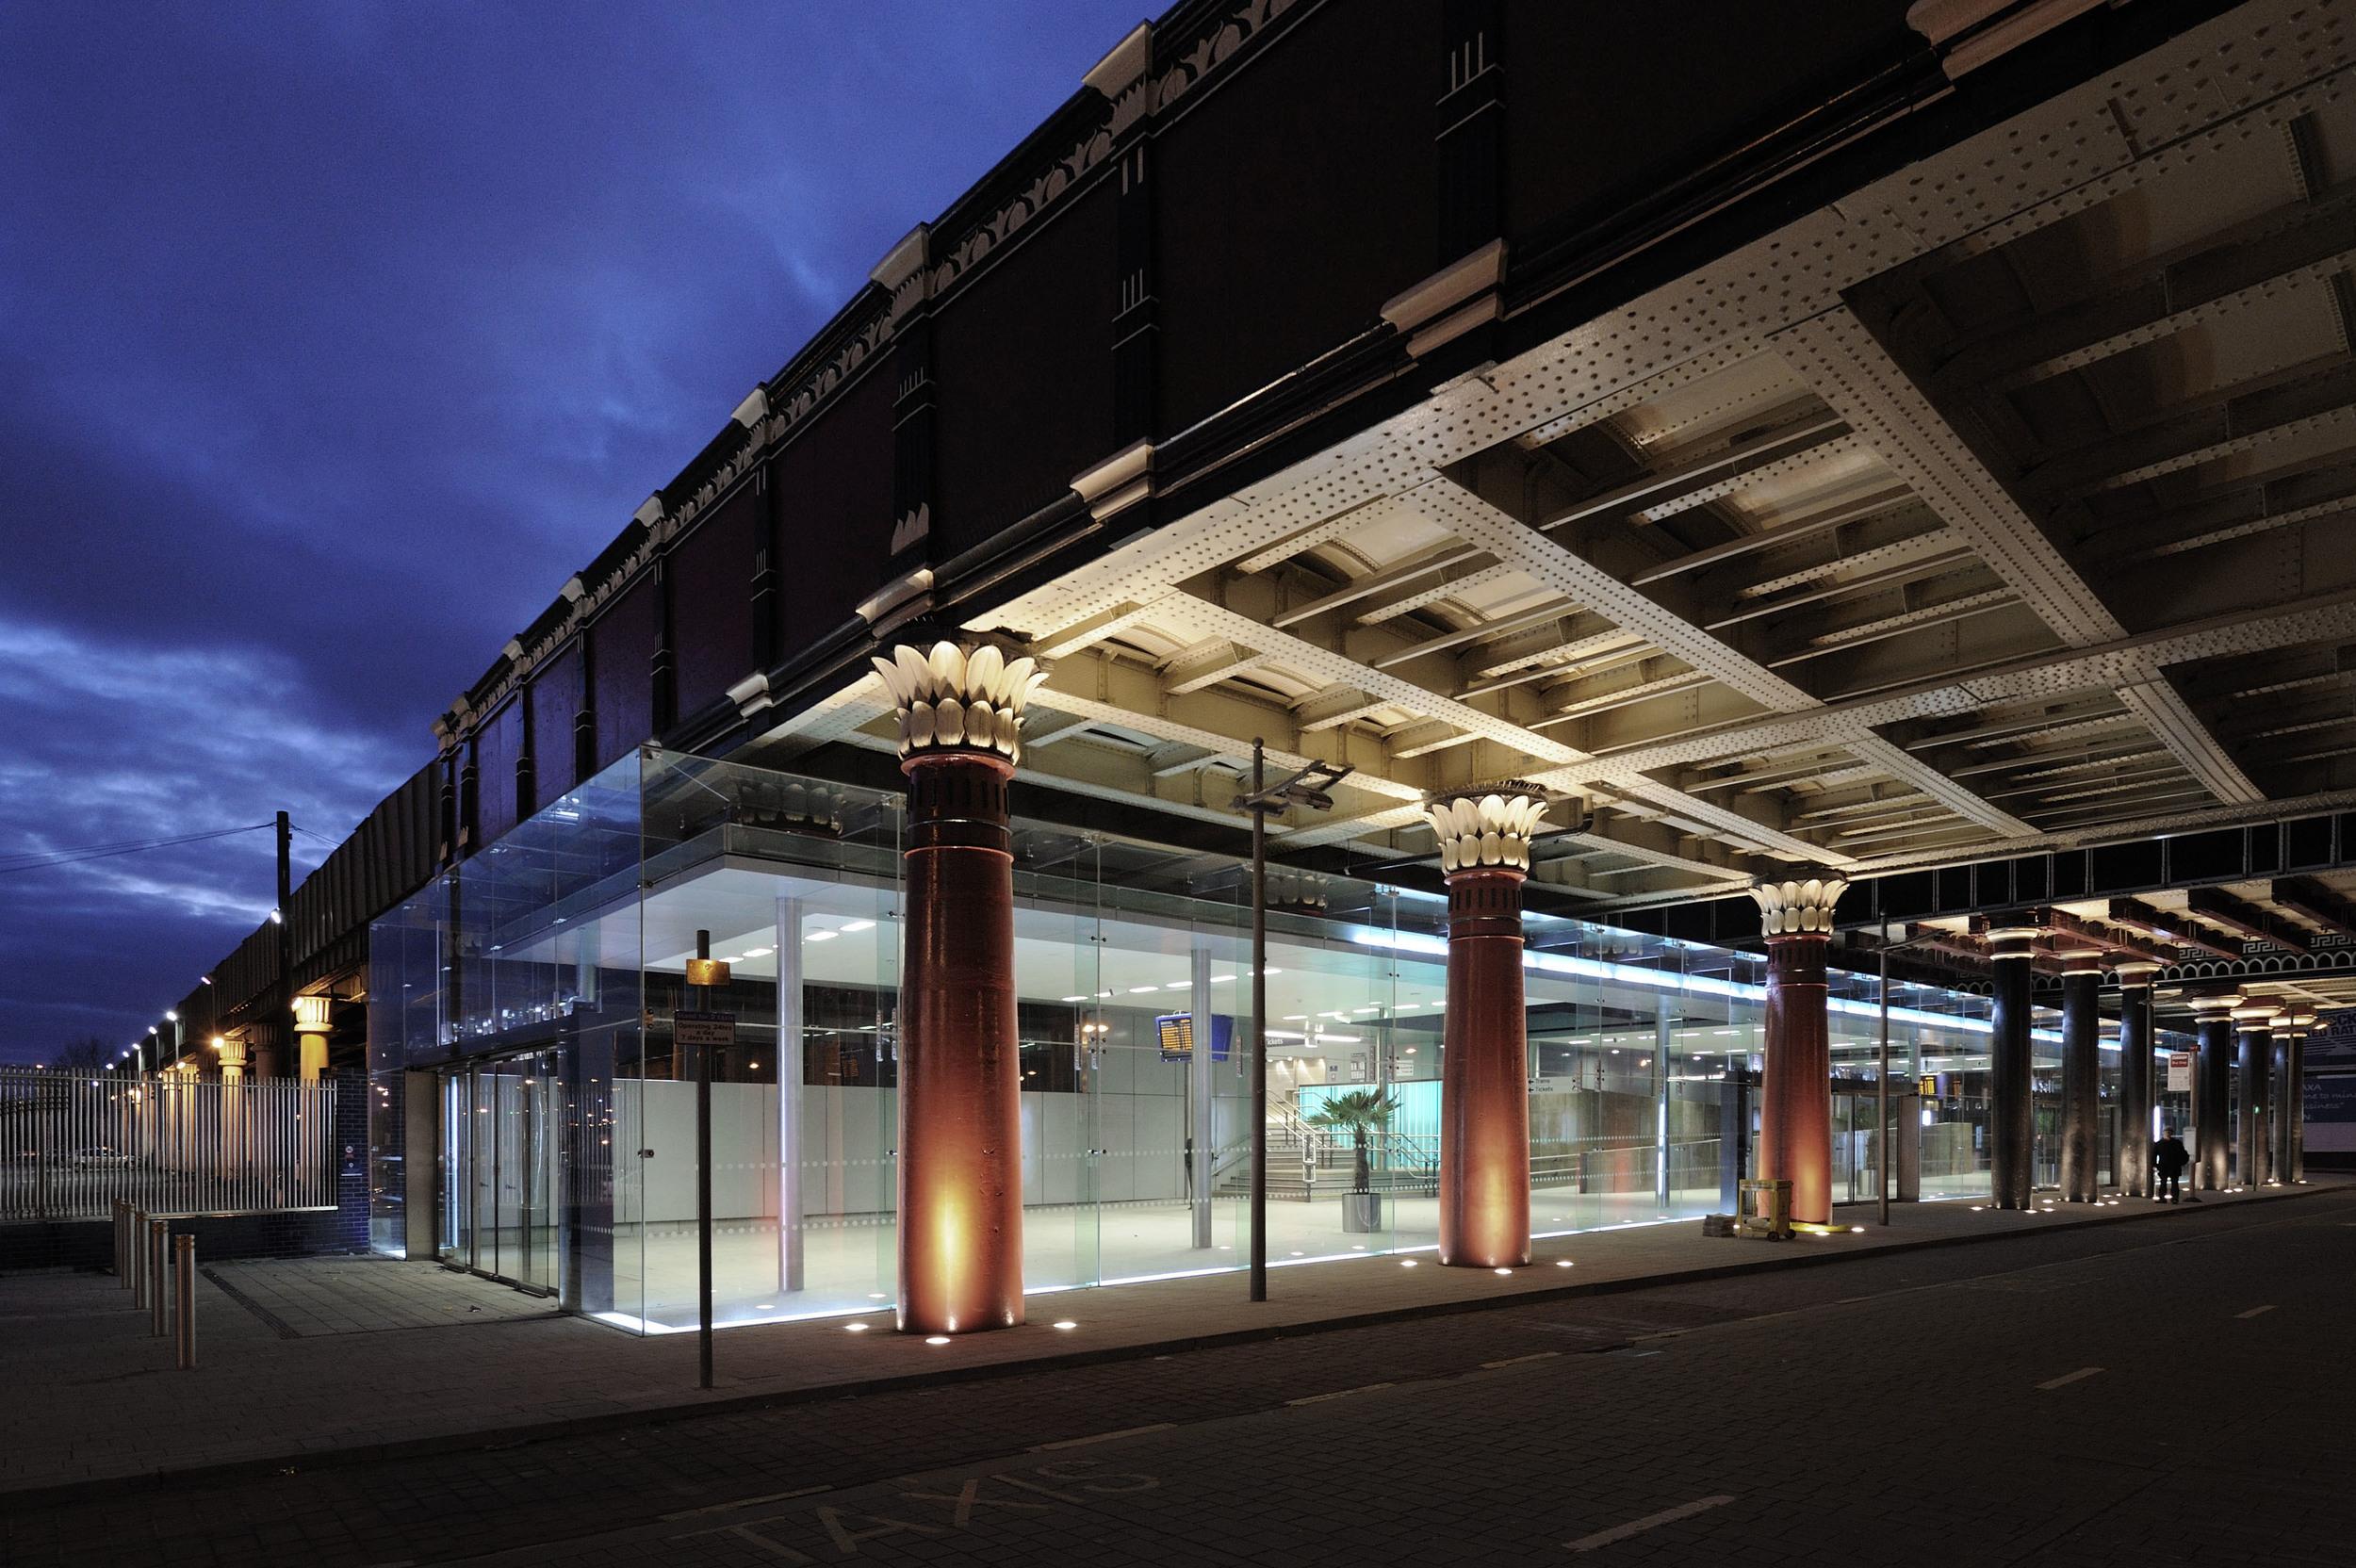 Salford Central Station Bridge at Night